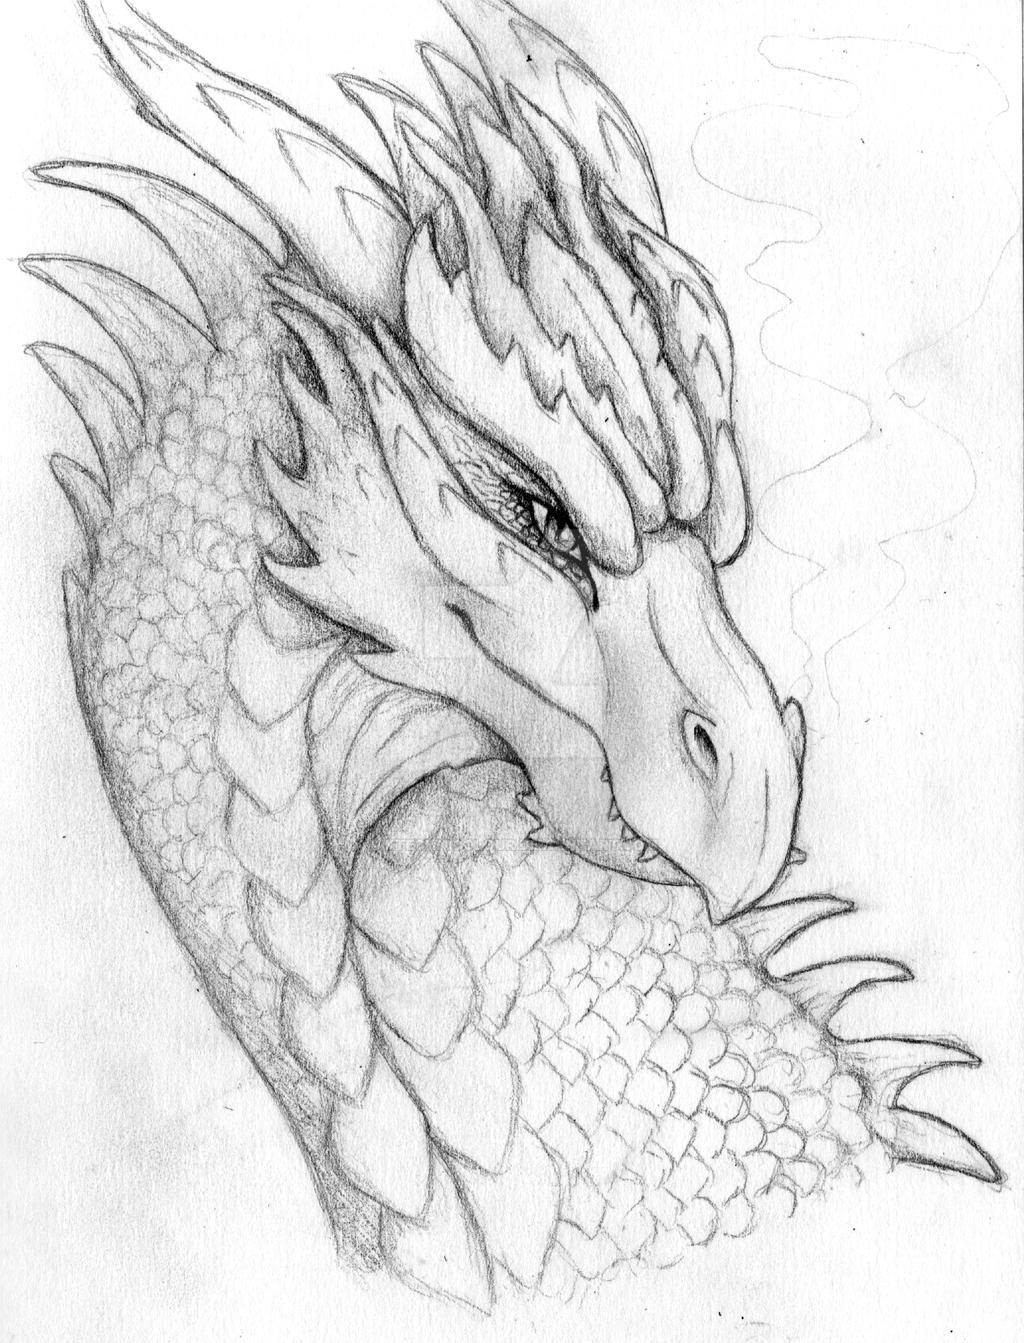 Dragon 2 by KTechnicolour